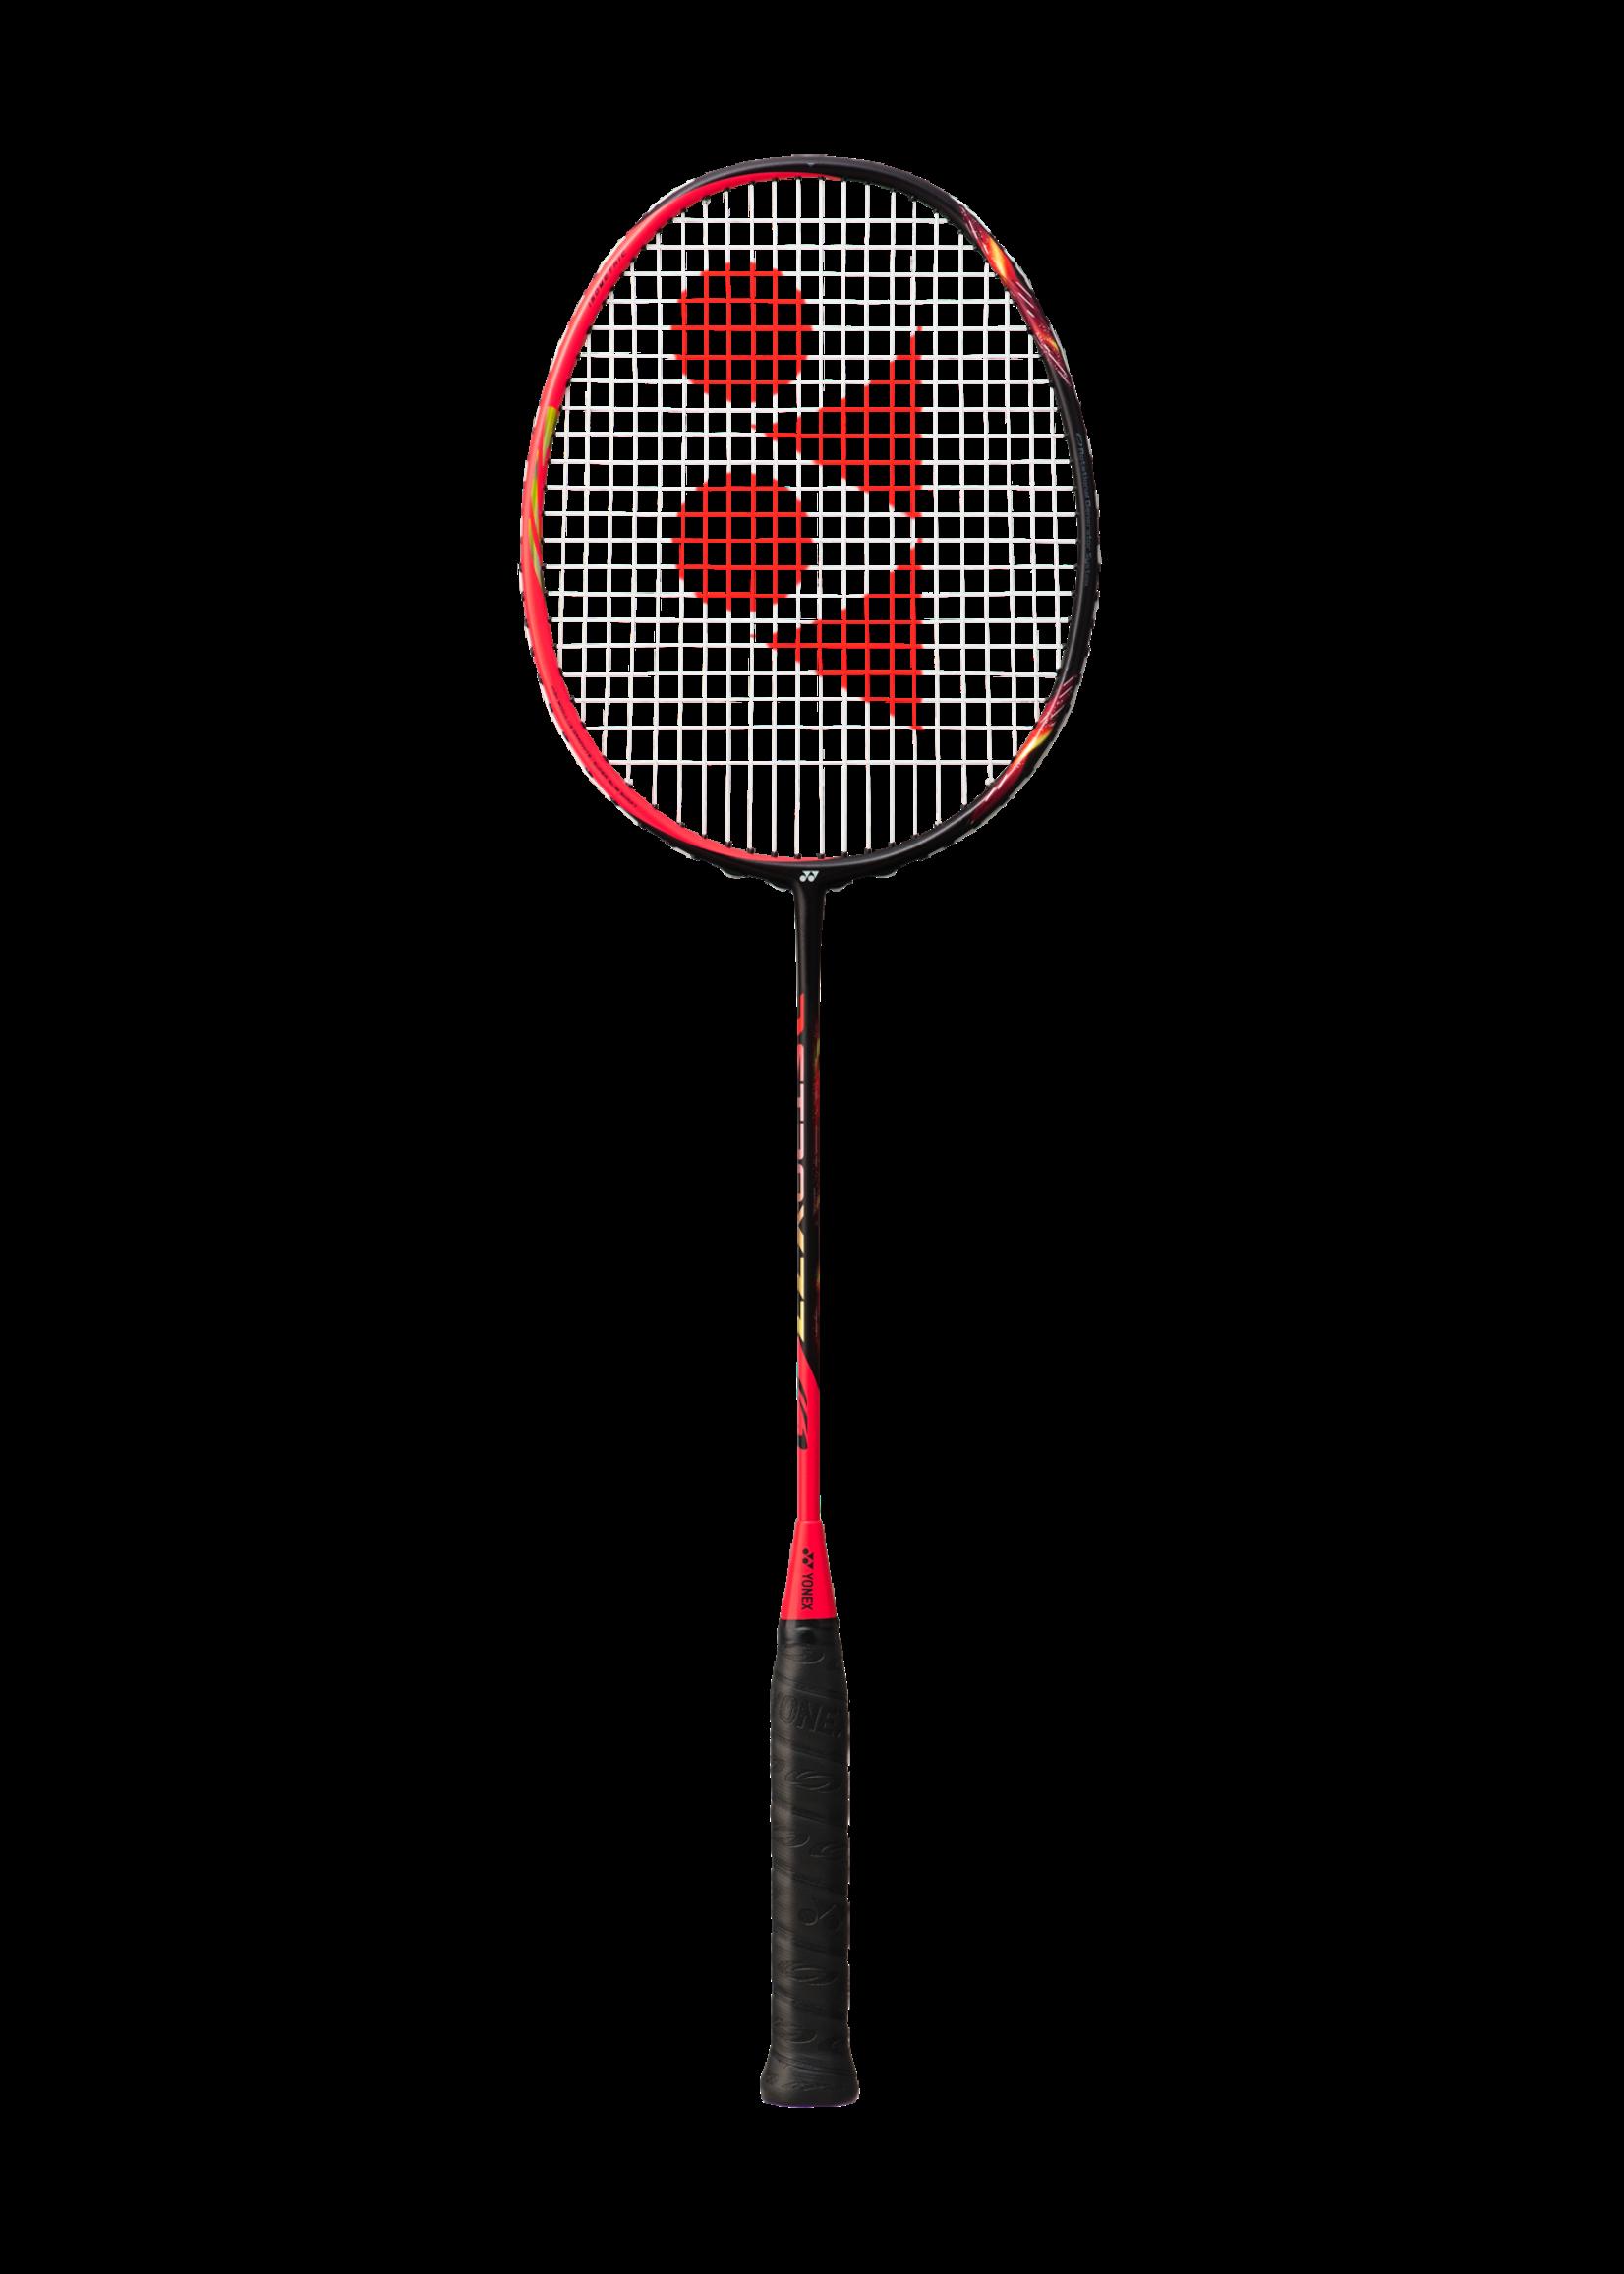 Yonex Yonex Astrox 77 Badminton Racket (2022) - Red (3U)